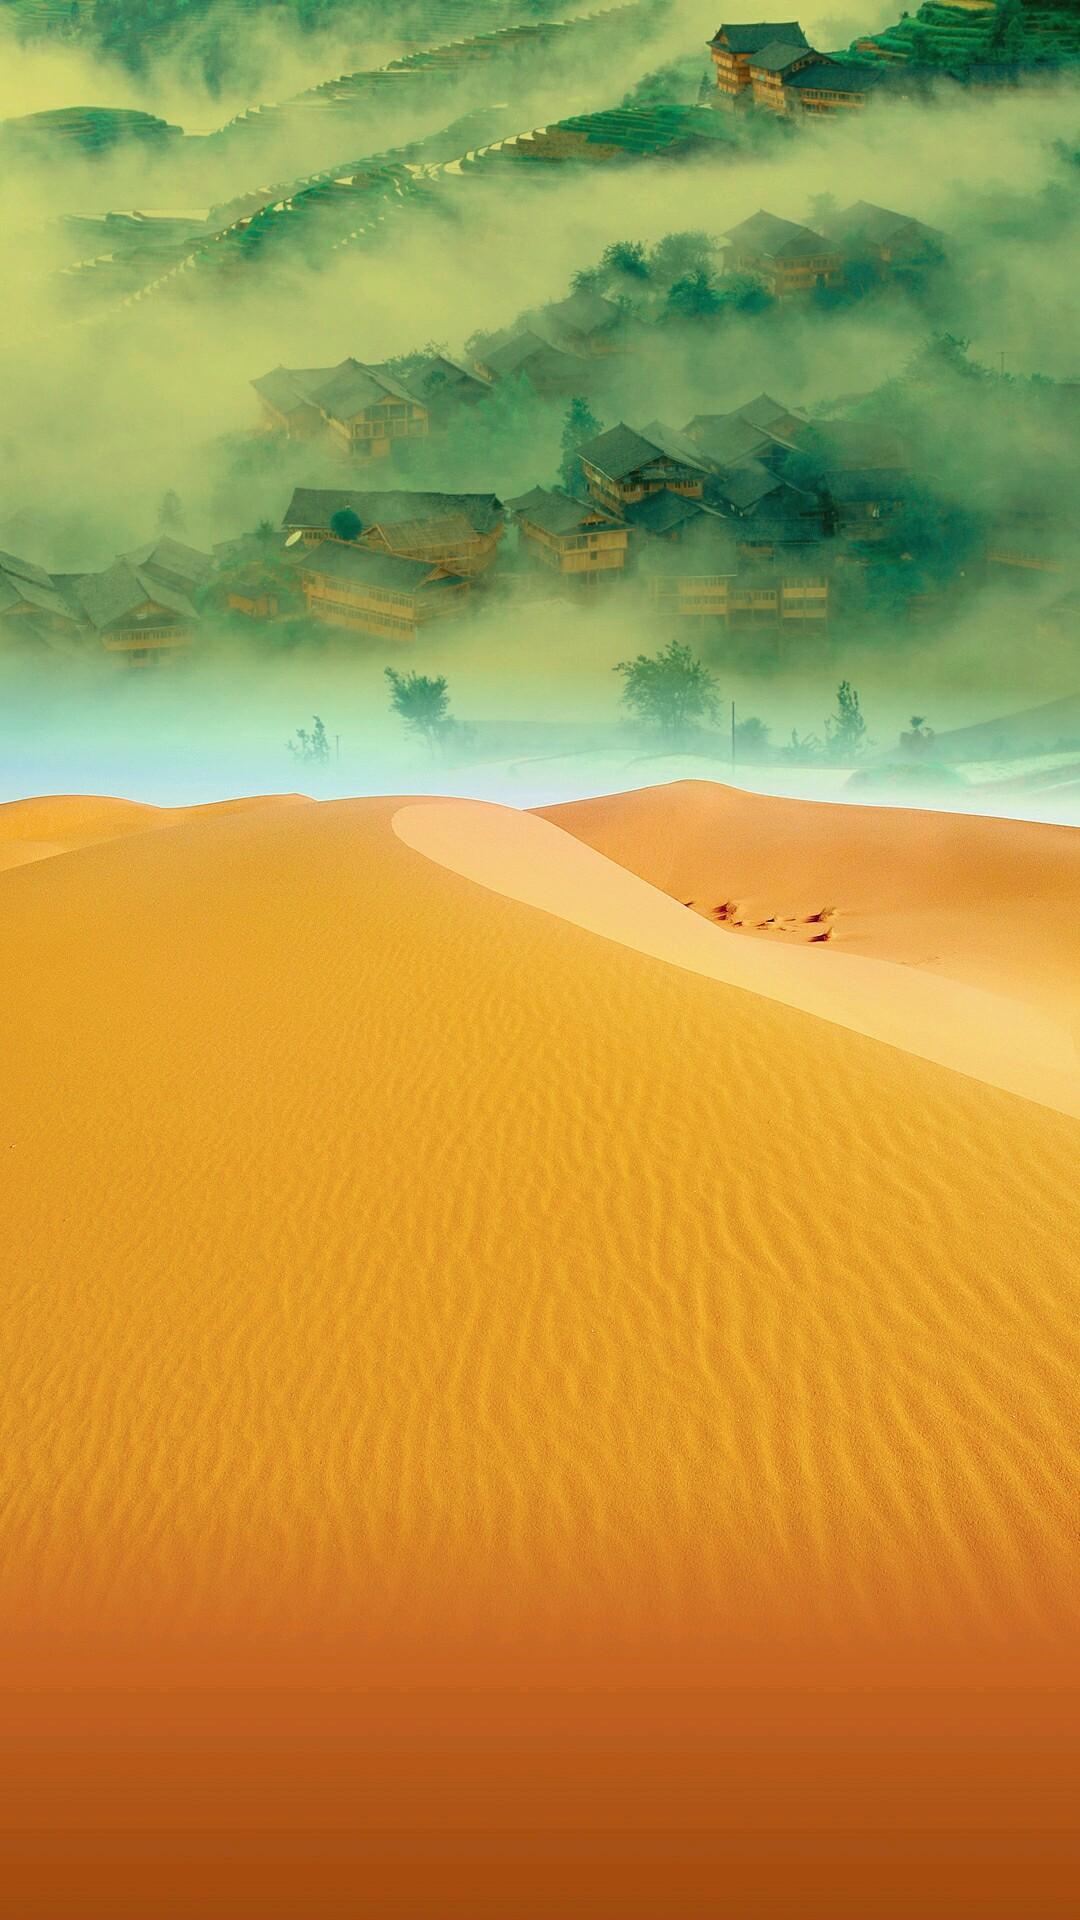 ps古装沙漠背景素材